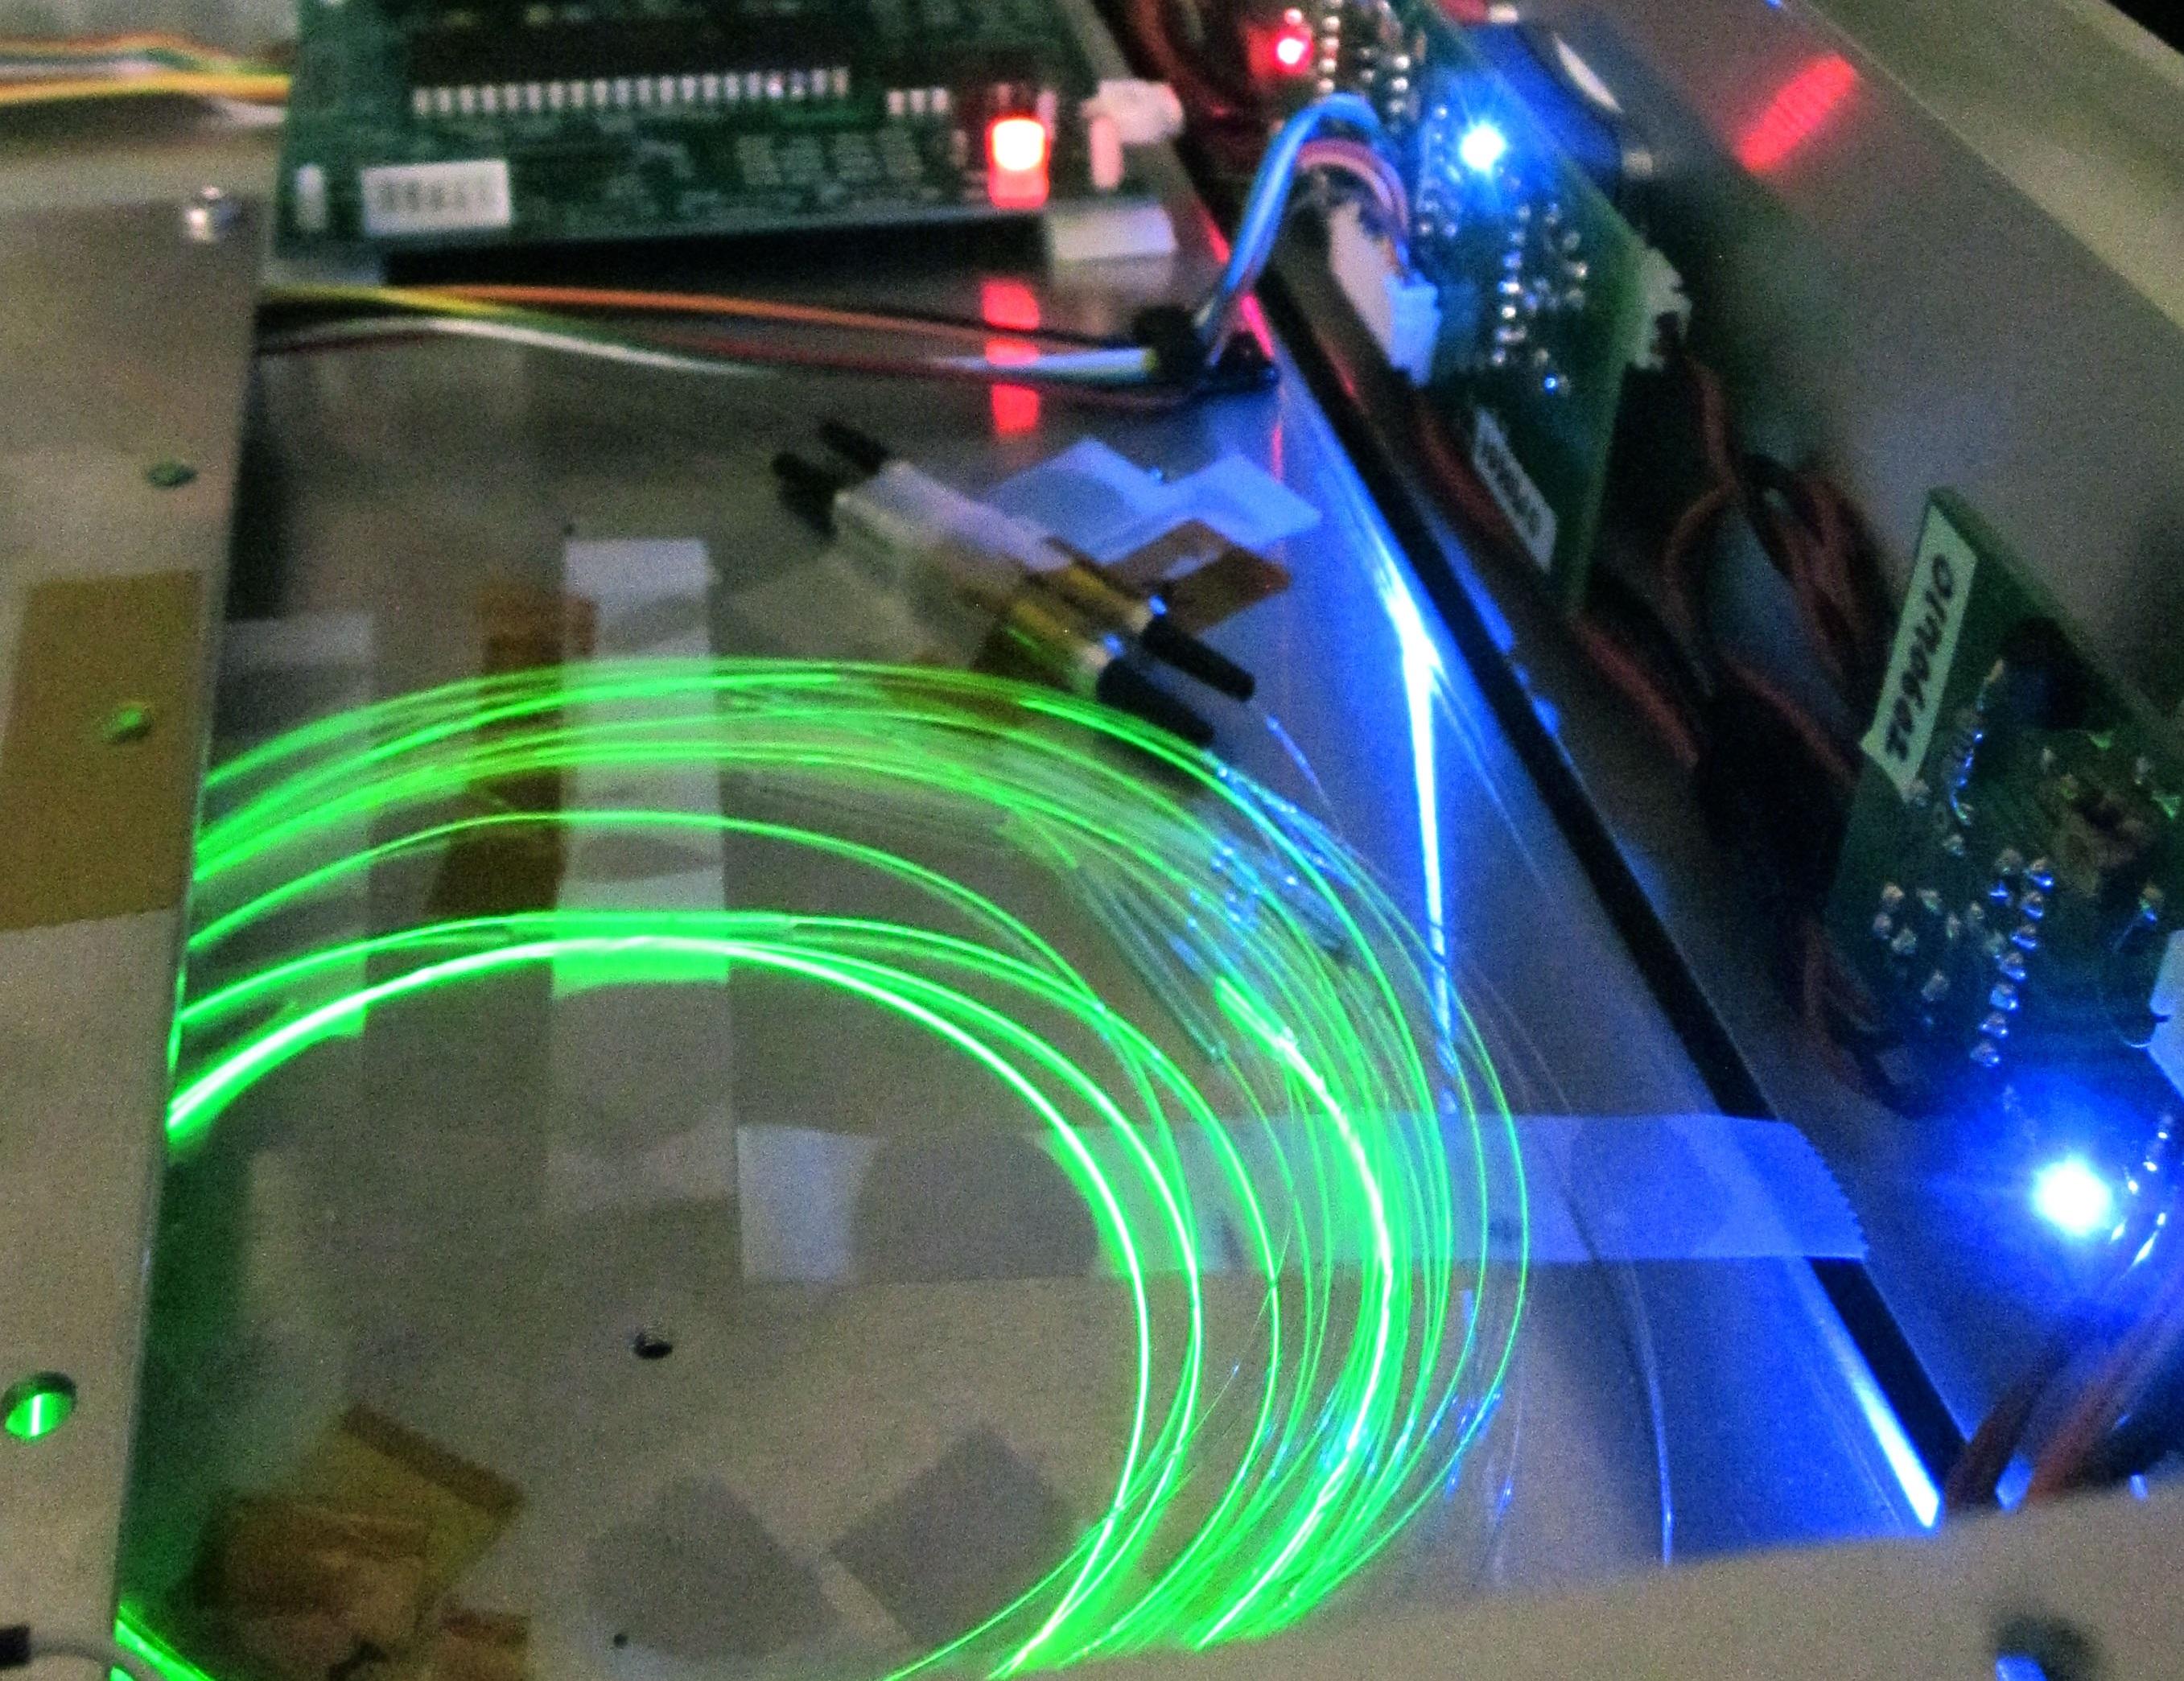 CNT Mode-Locked Fiber Laser